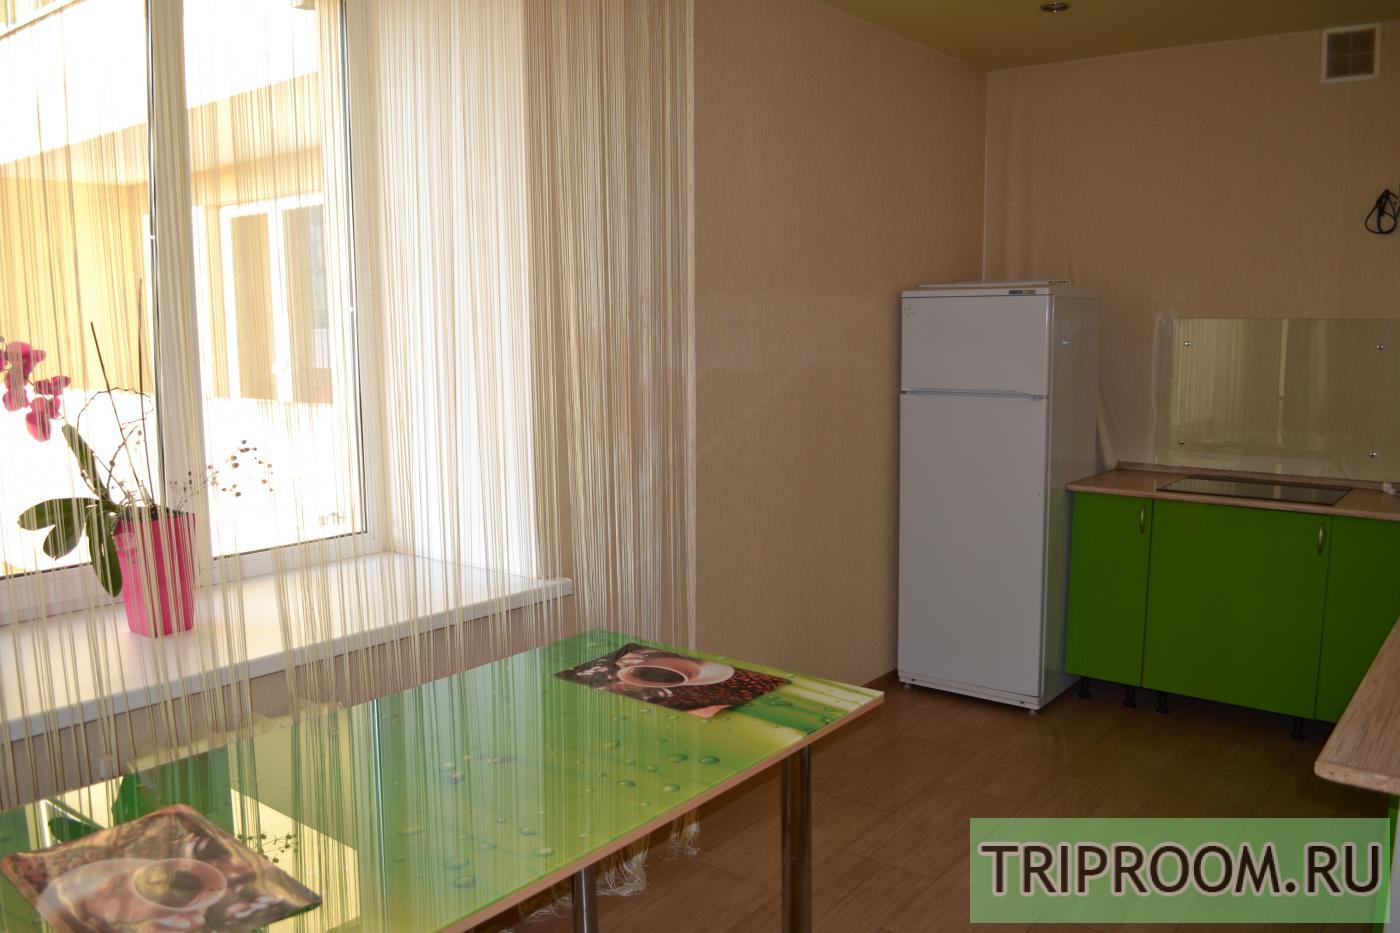 1-комнатная квартира посуточно (вариант № 591), ул. Революции проспект, фото № 14